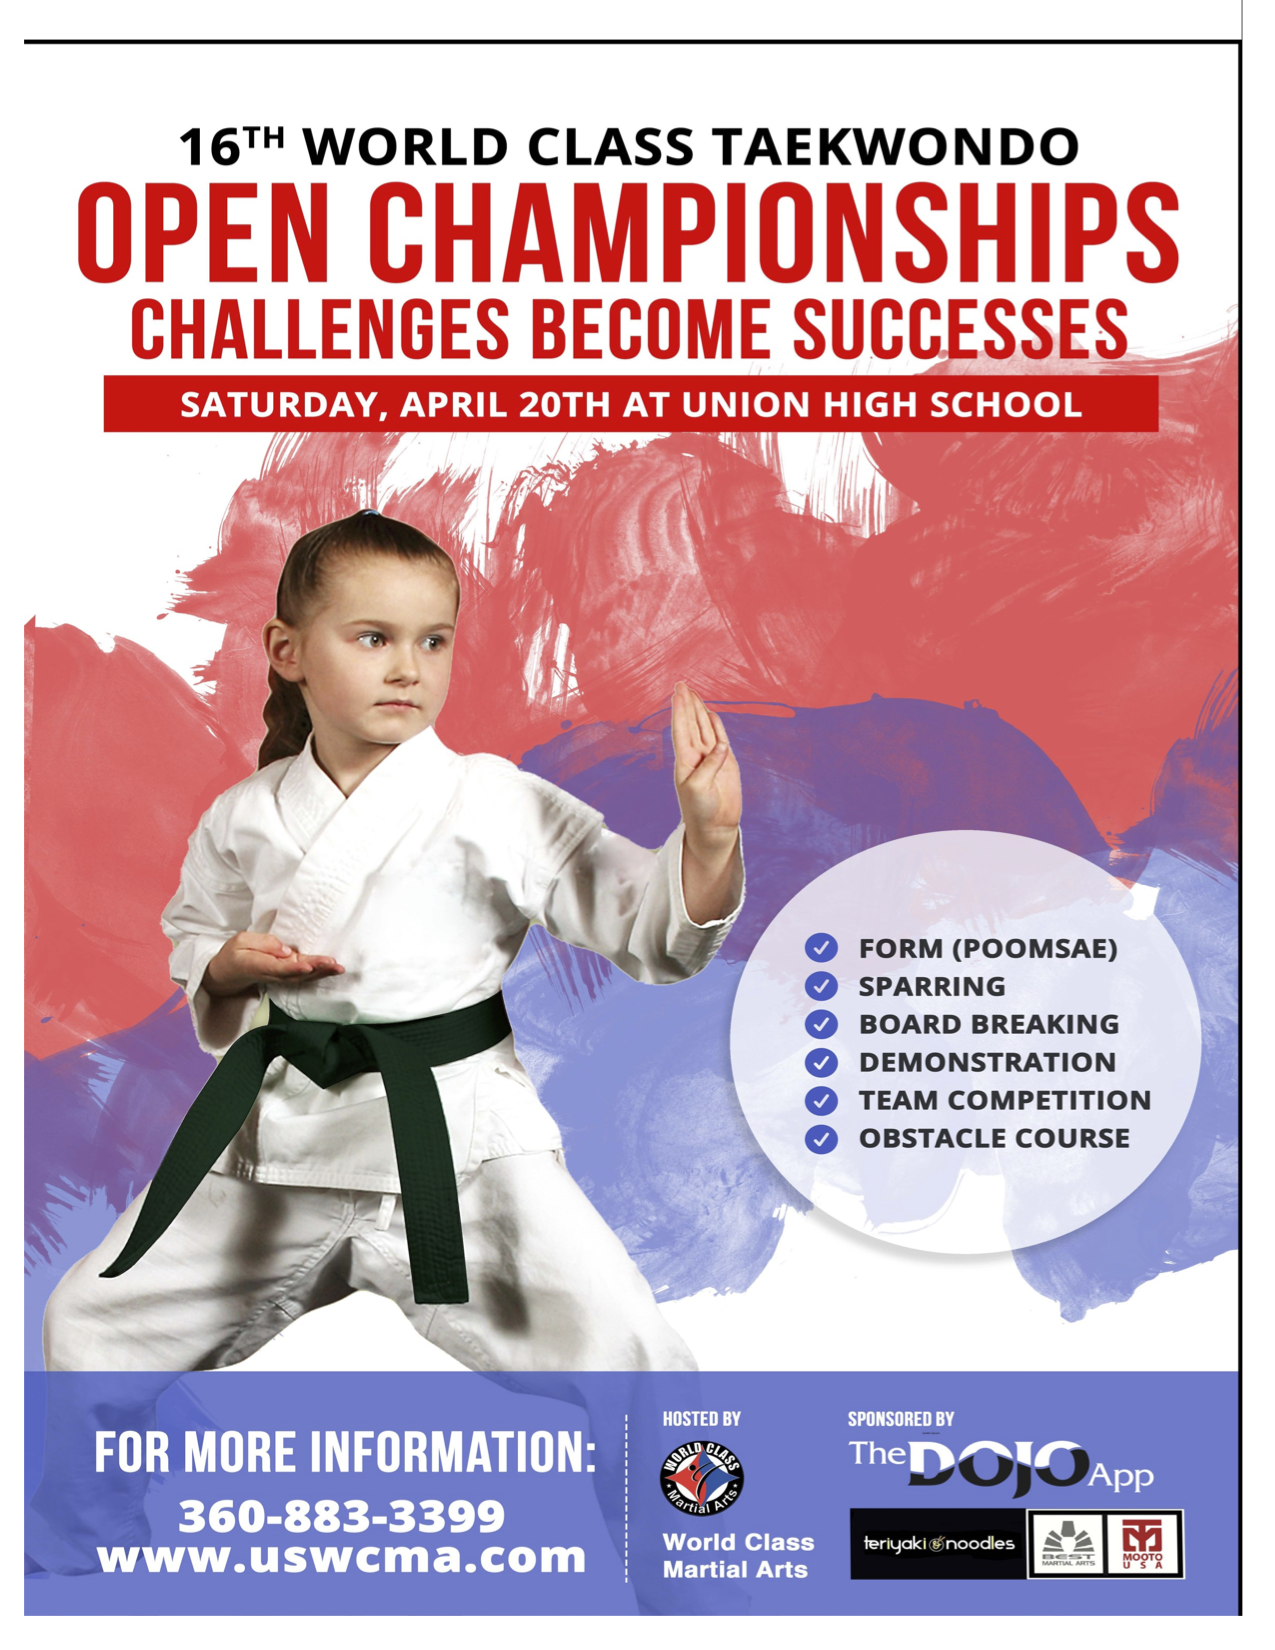 2019 WCMA Open Championship